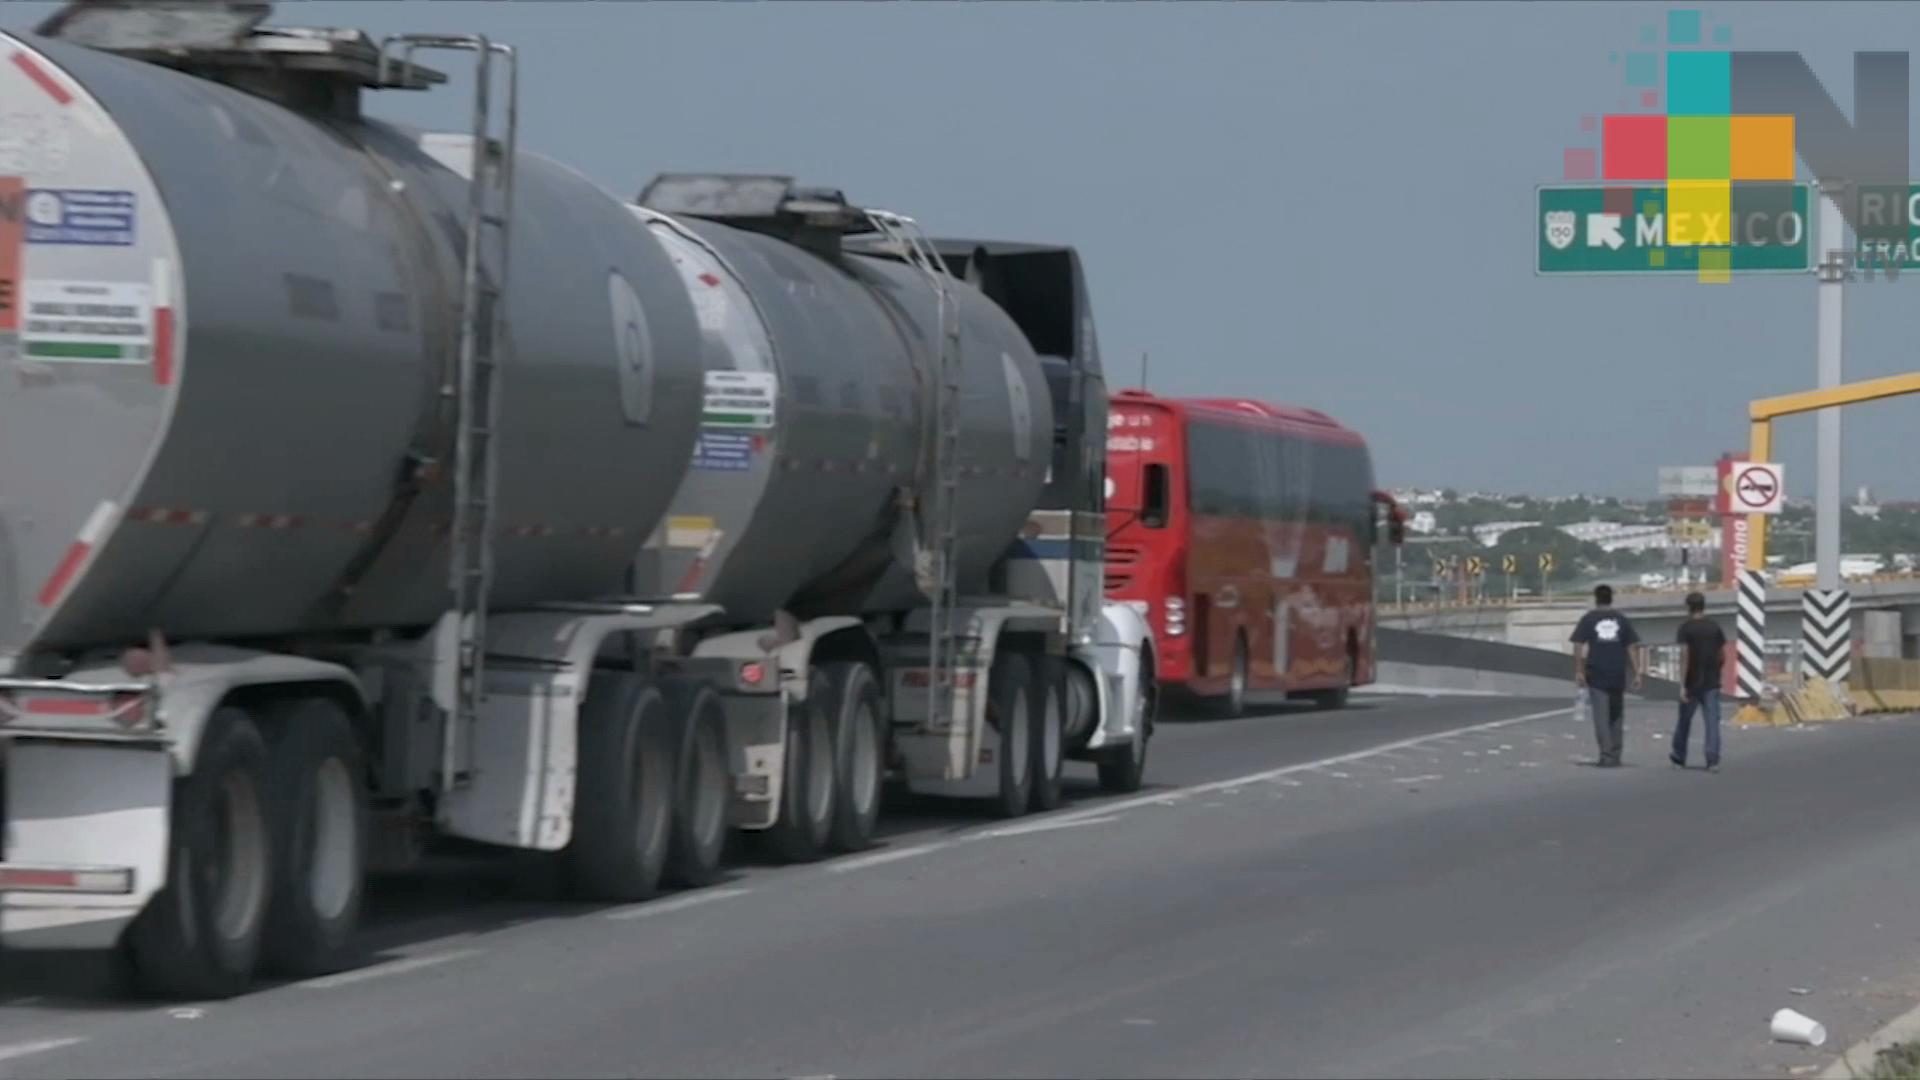 Gobierno federal contratará a dos mil choferes de pipas para distribuir gasolina